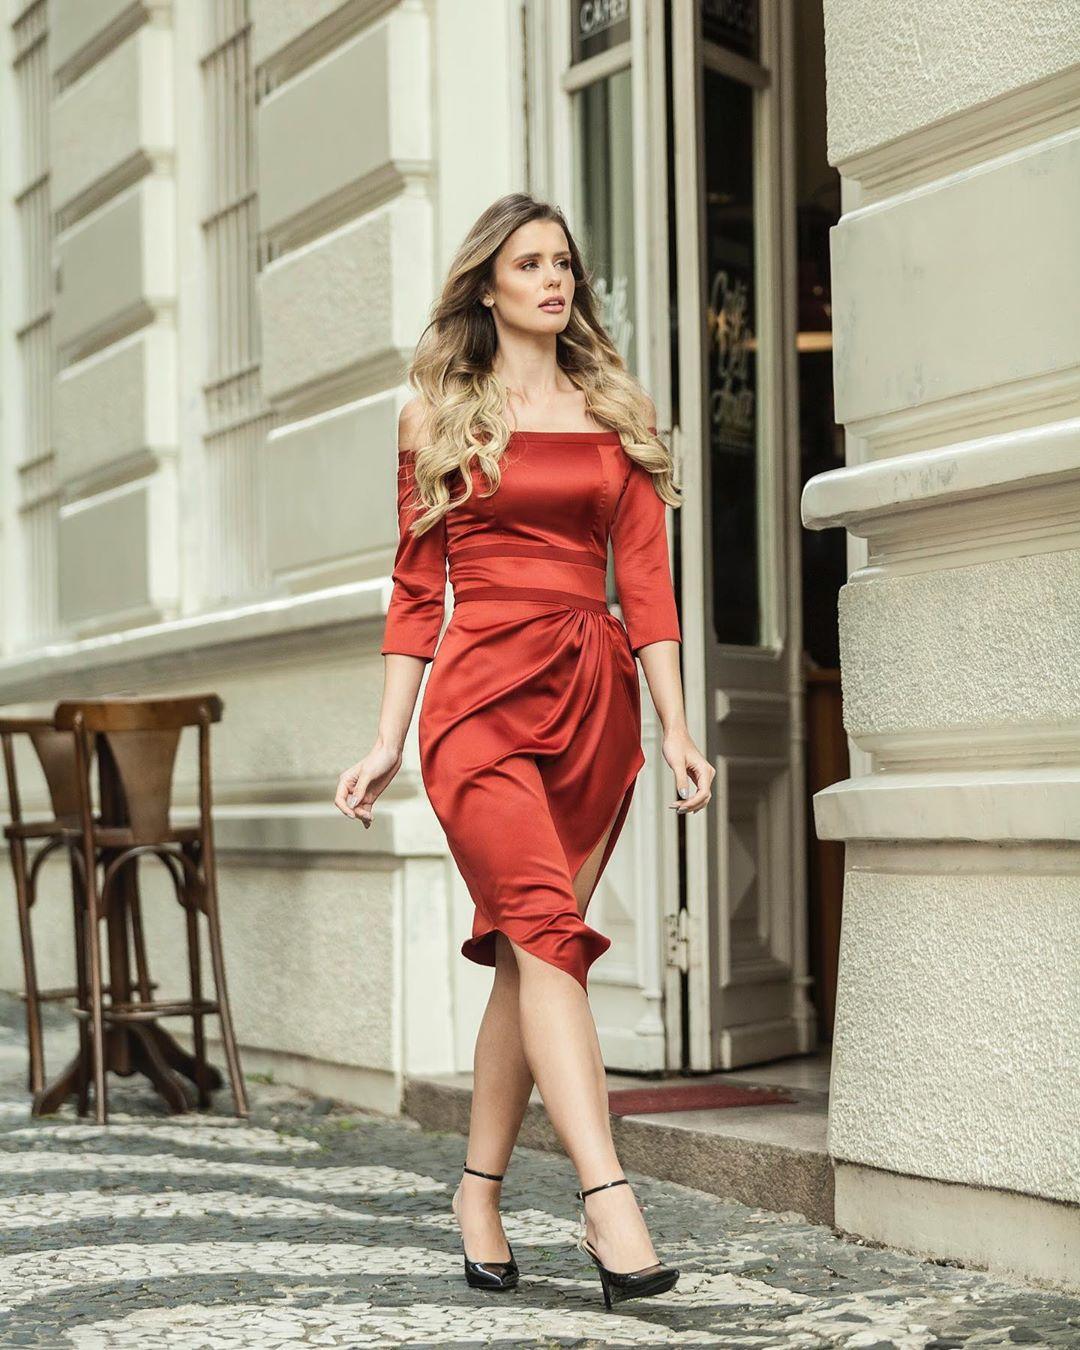 marcella kozinski de barros, 3rd runner-up de miss tourism world 2019. 67346310